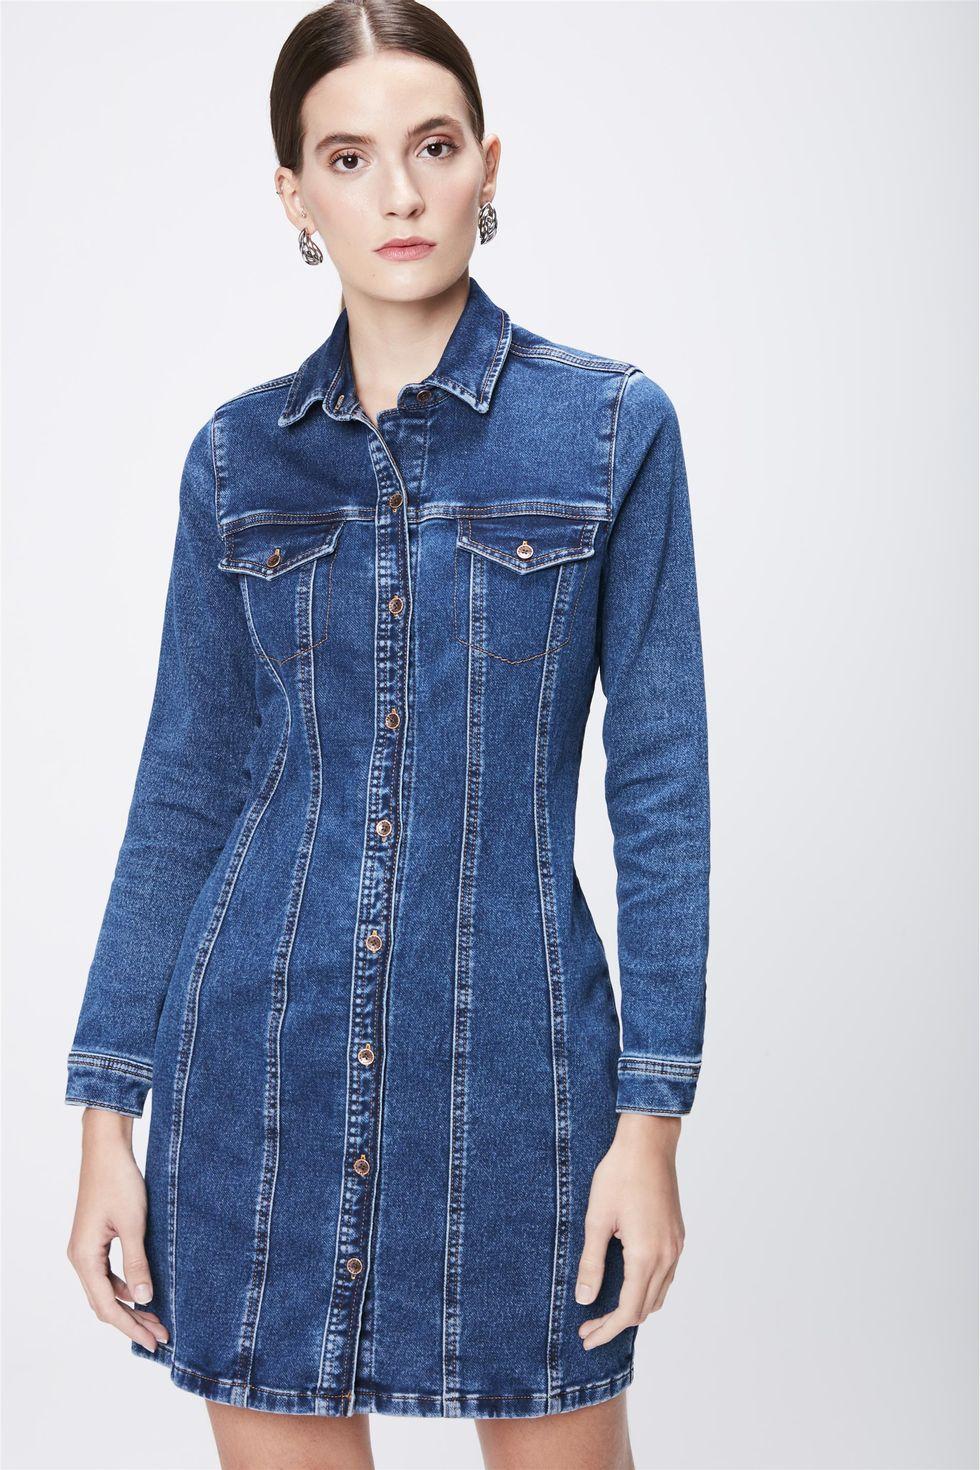 Vestido-Jeans-Manga-Longa-Frente--